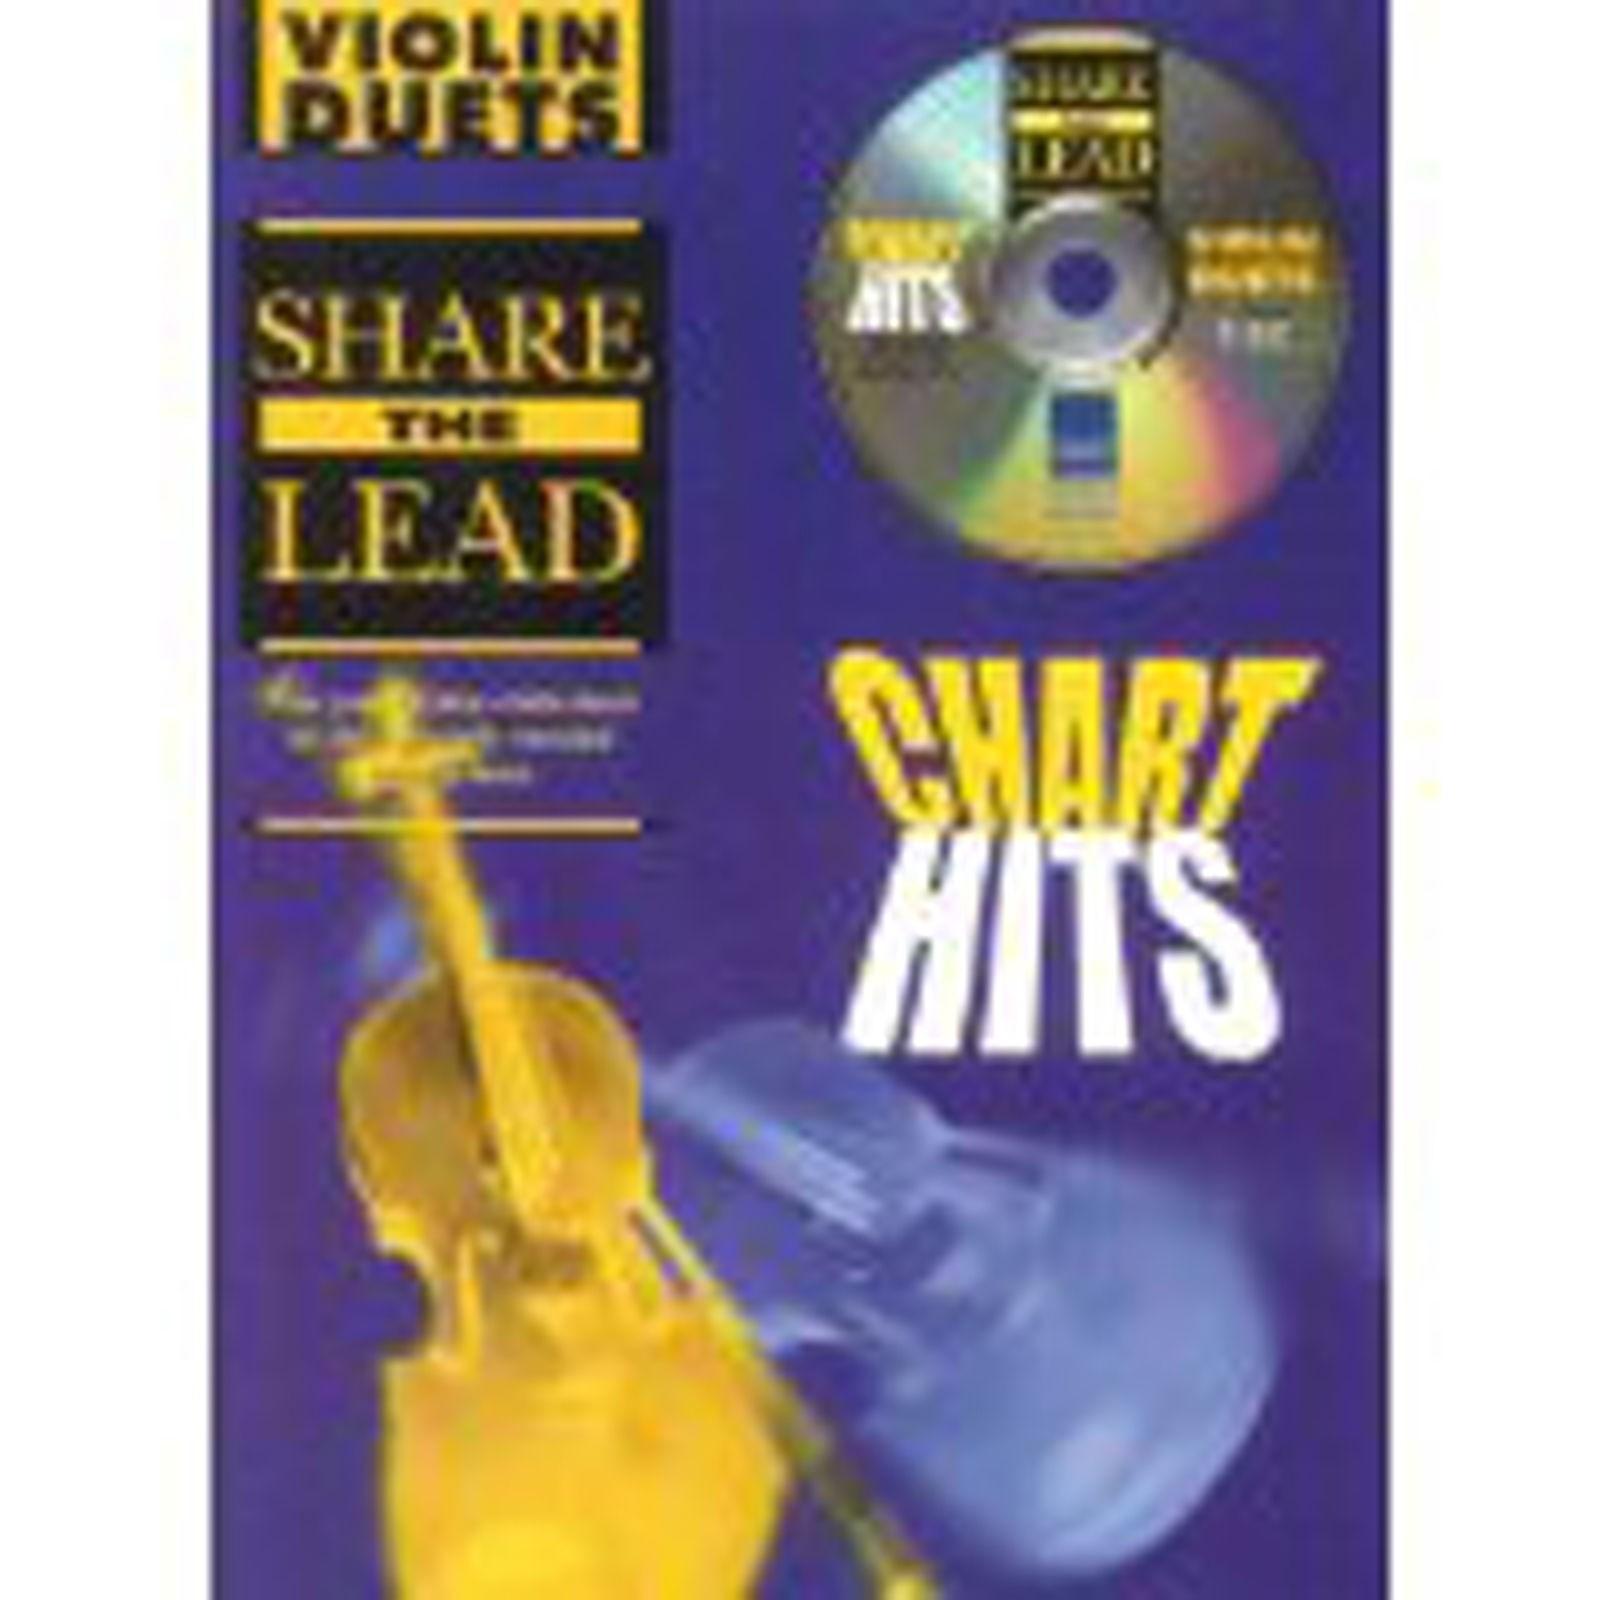 Share The Lead Violin Duets Chart Hits Book & Playalong CD B45